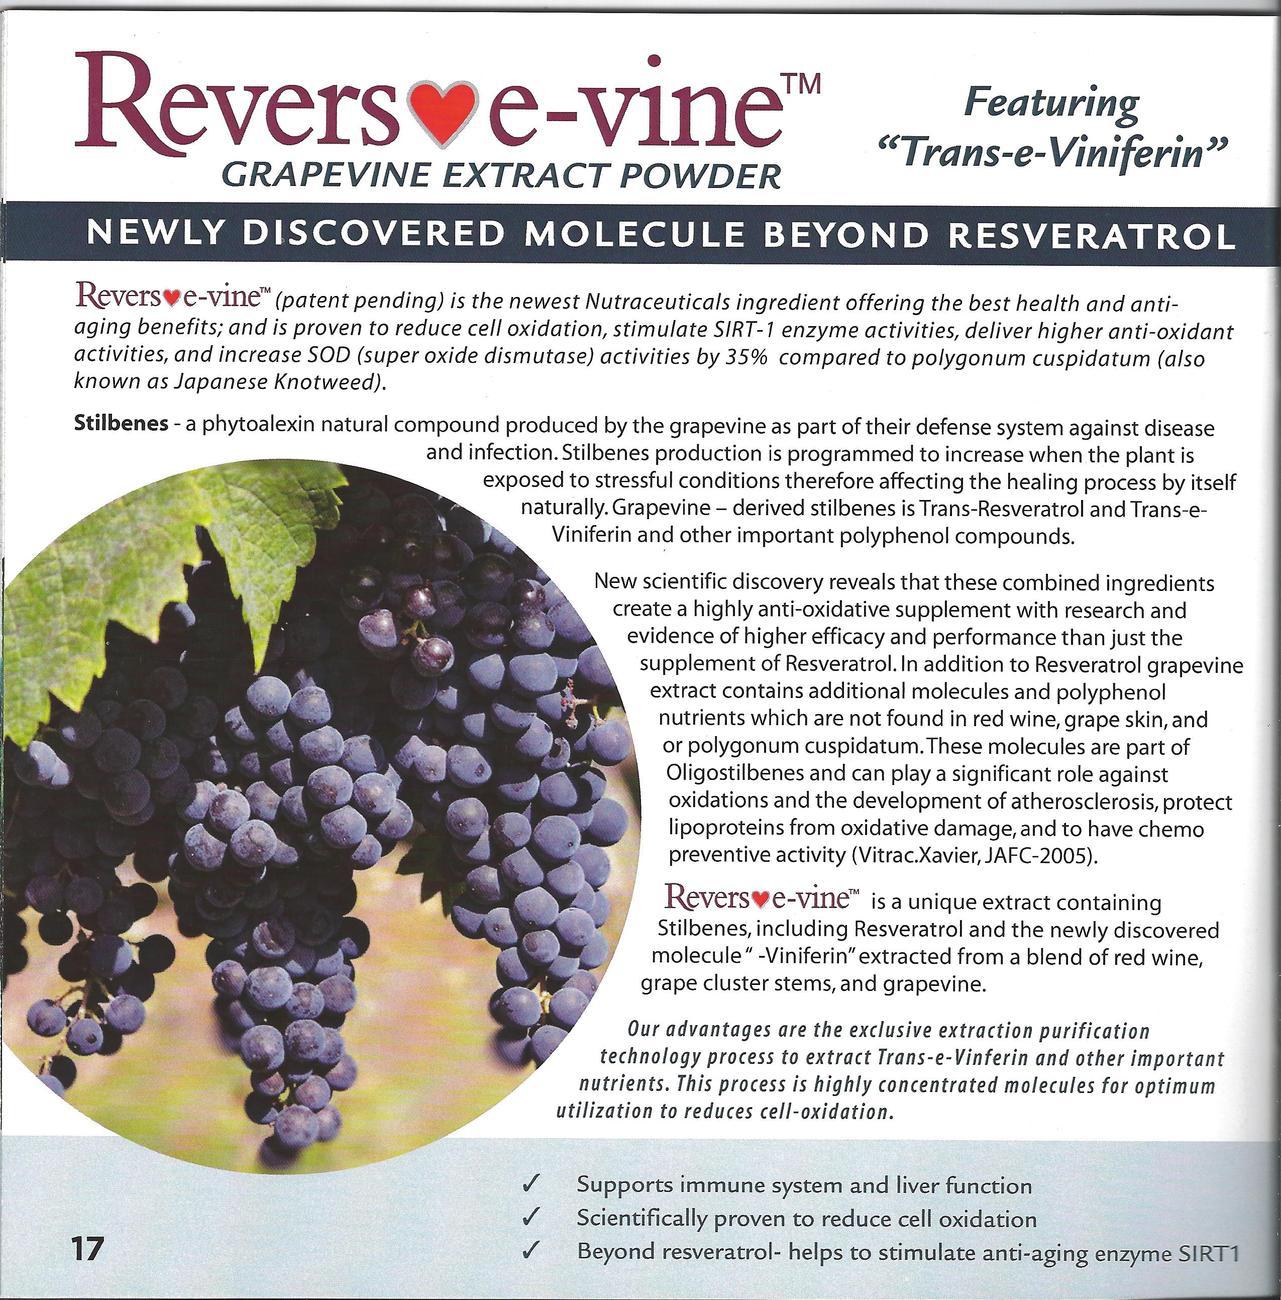 REVERS♥E-VINE- GRAPEVINE ANTIOXIDANT FEATURING TRANS-e-VINIFERIN